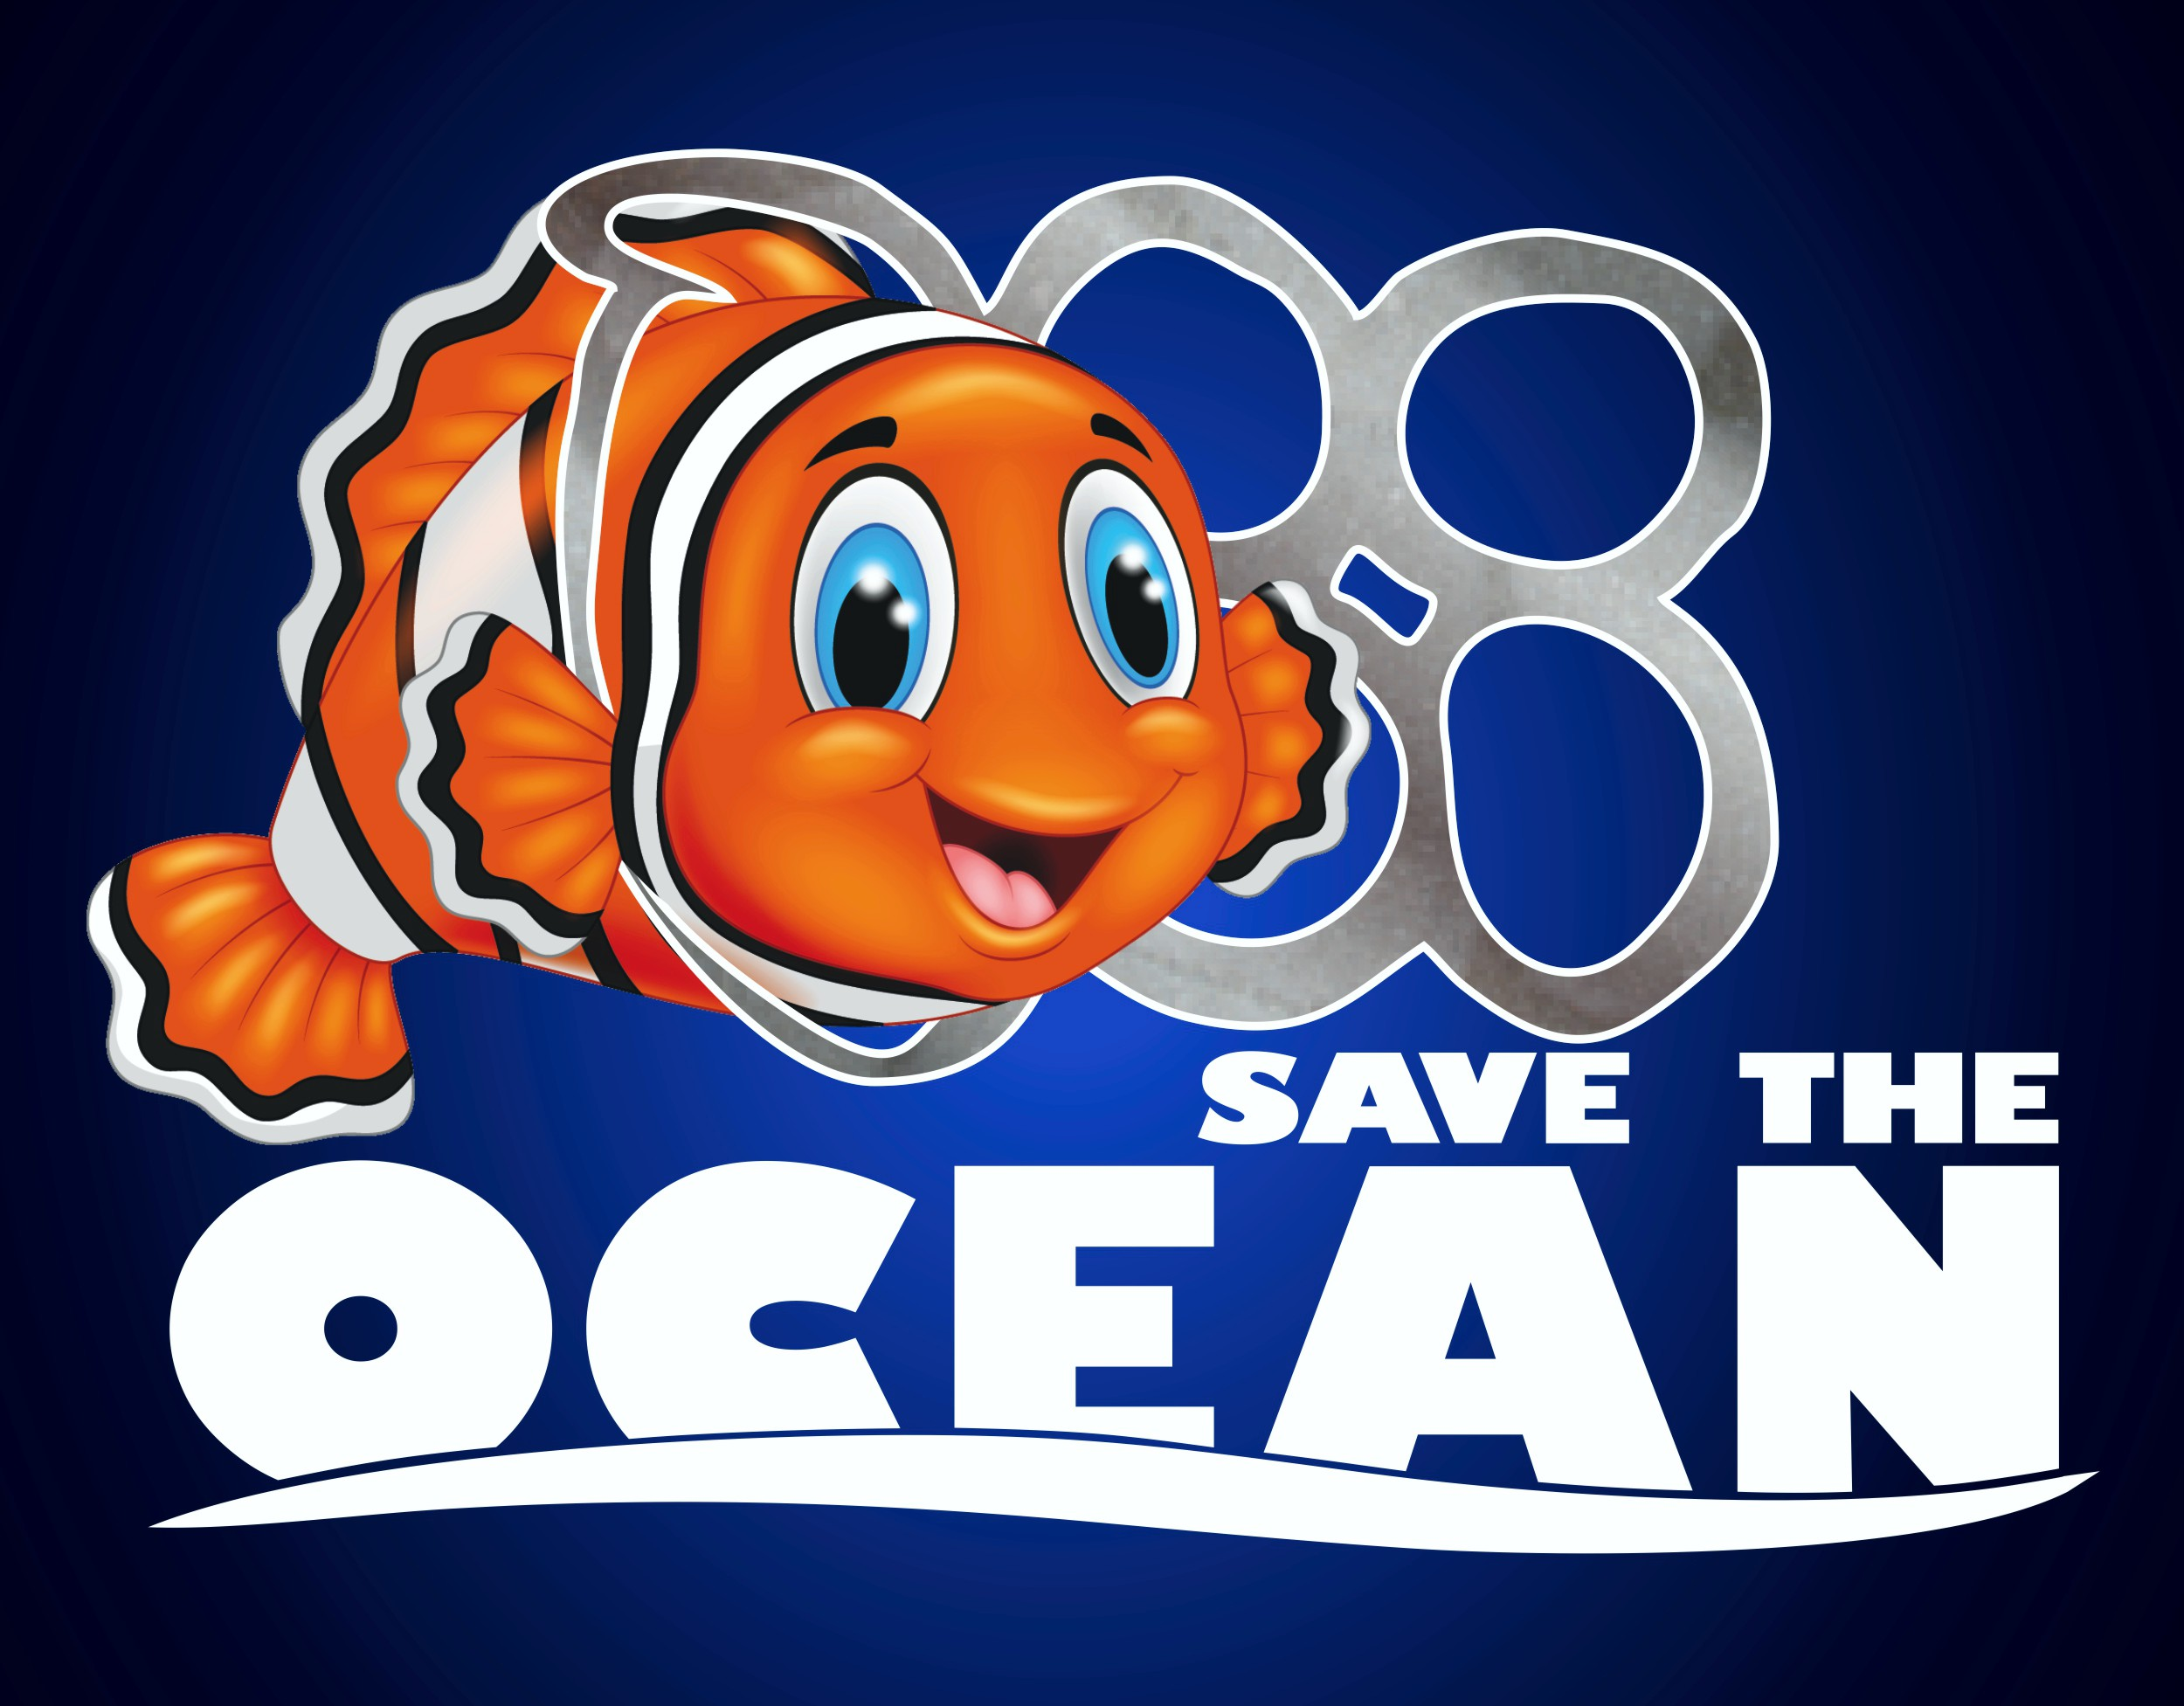 Aufkleber Save the ocean 115 x 149 mm 001